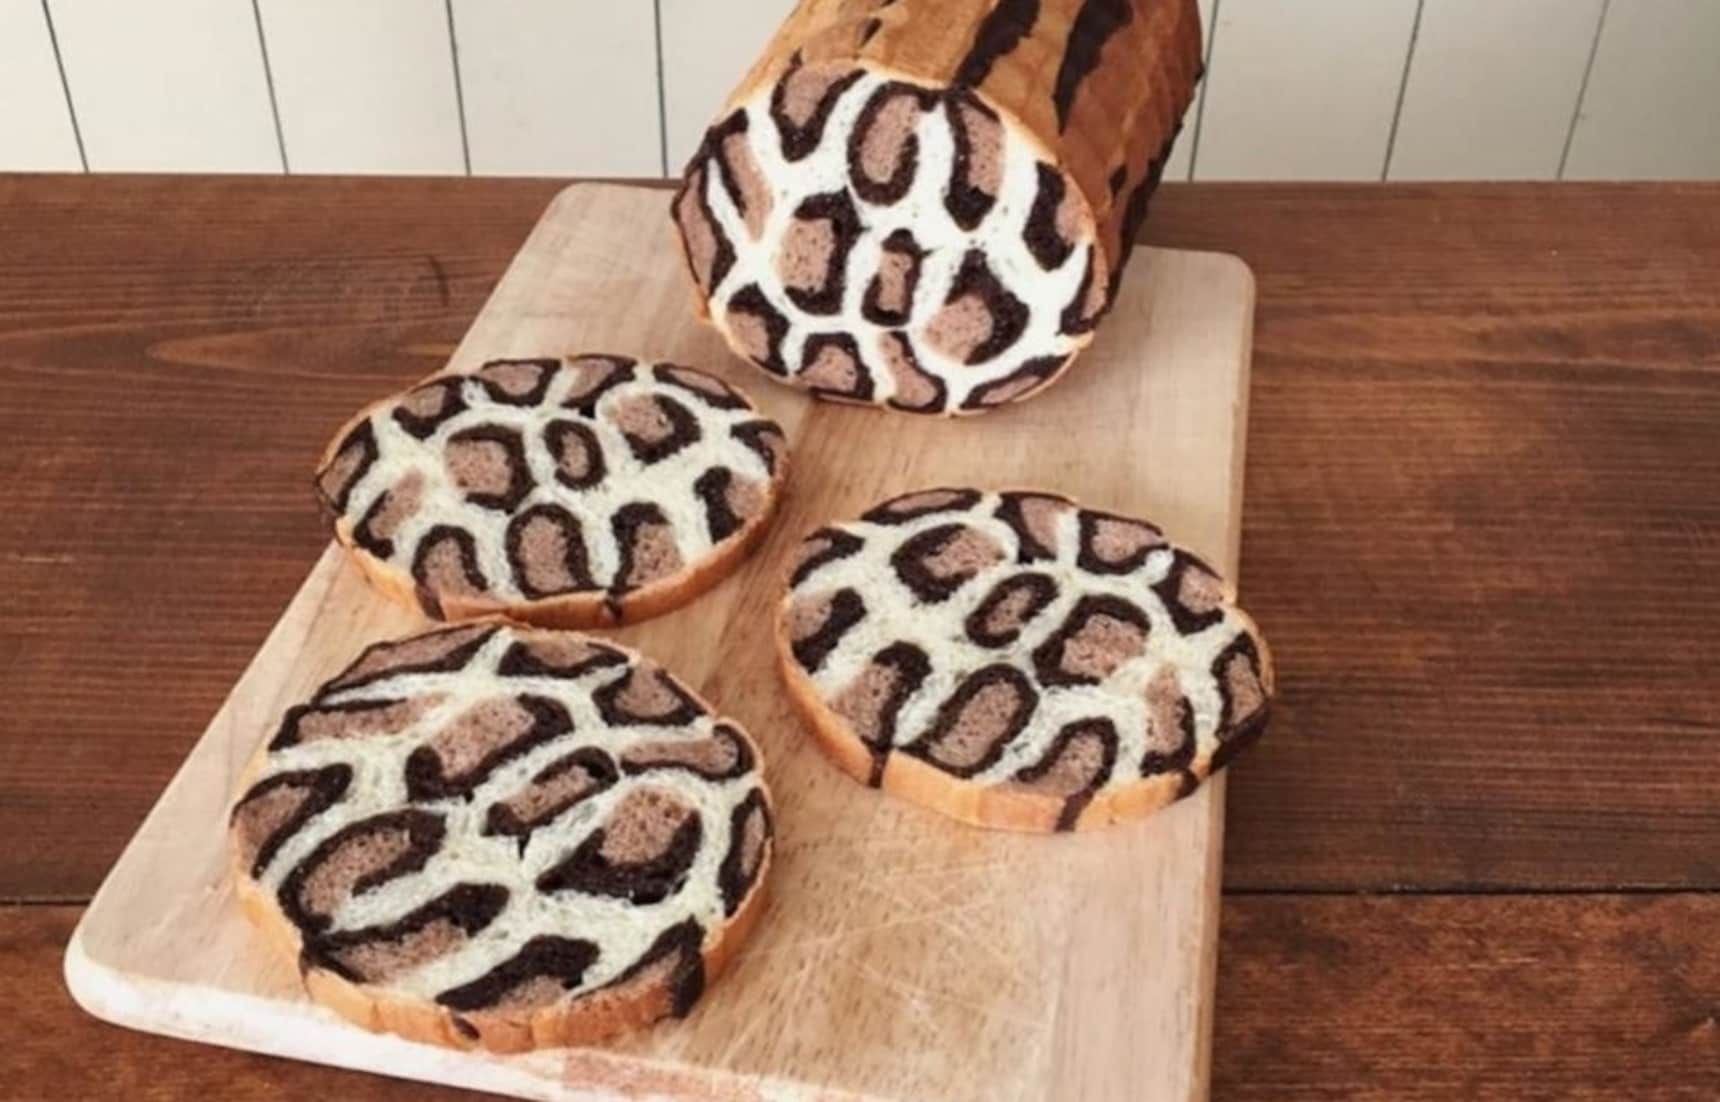 Japanese Baker Reveals Beautiful Bread Art